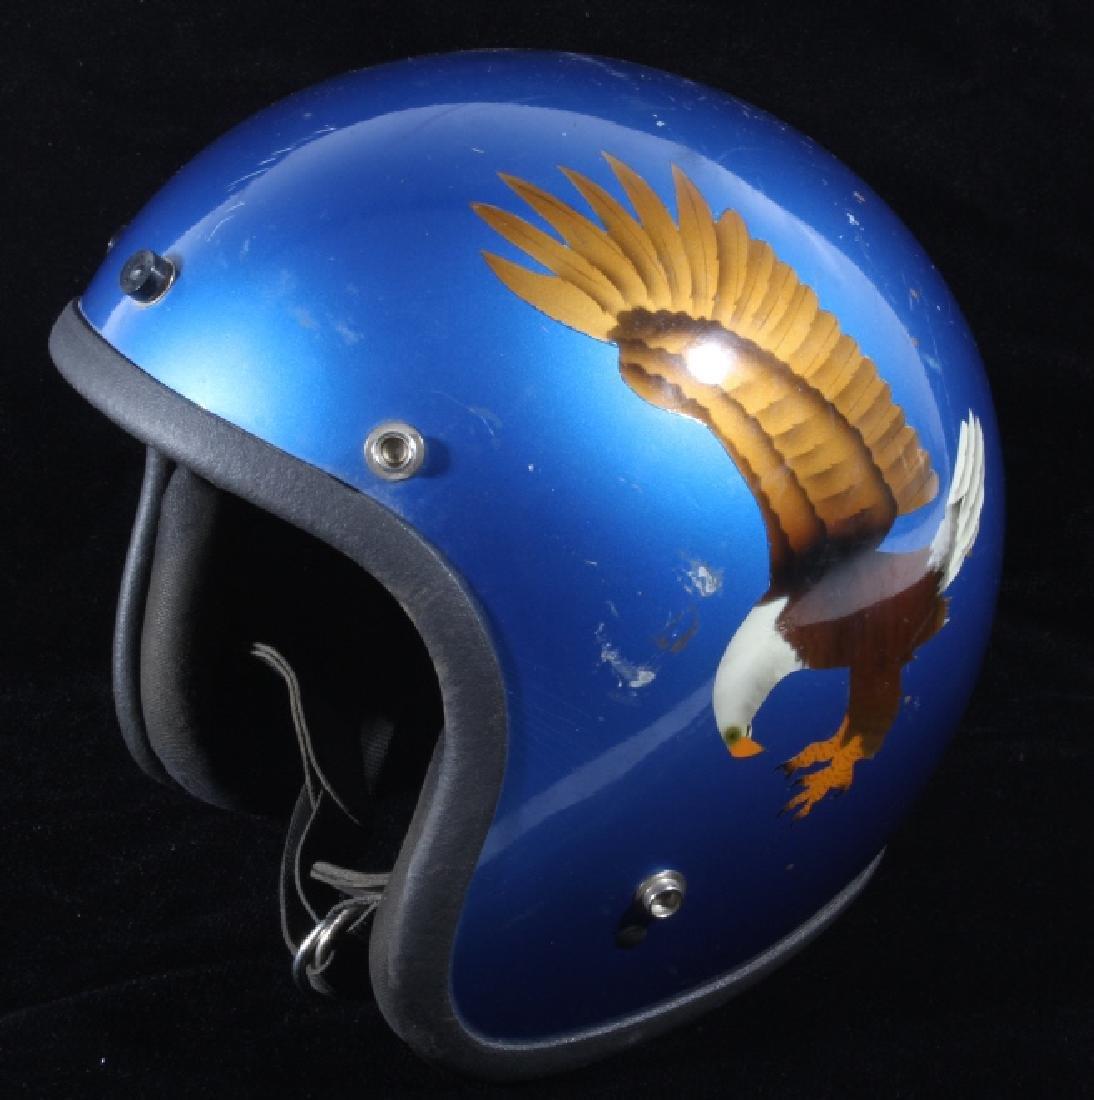 Vintage Delgado Bald Eagle Open Face Helmet